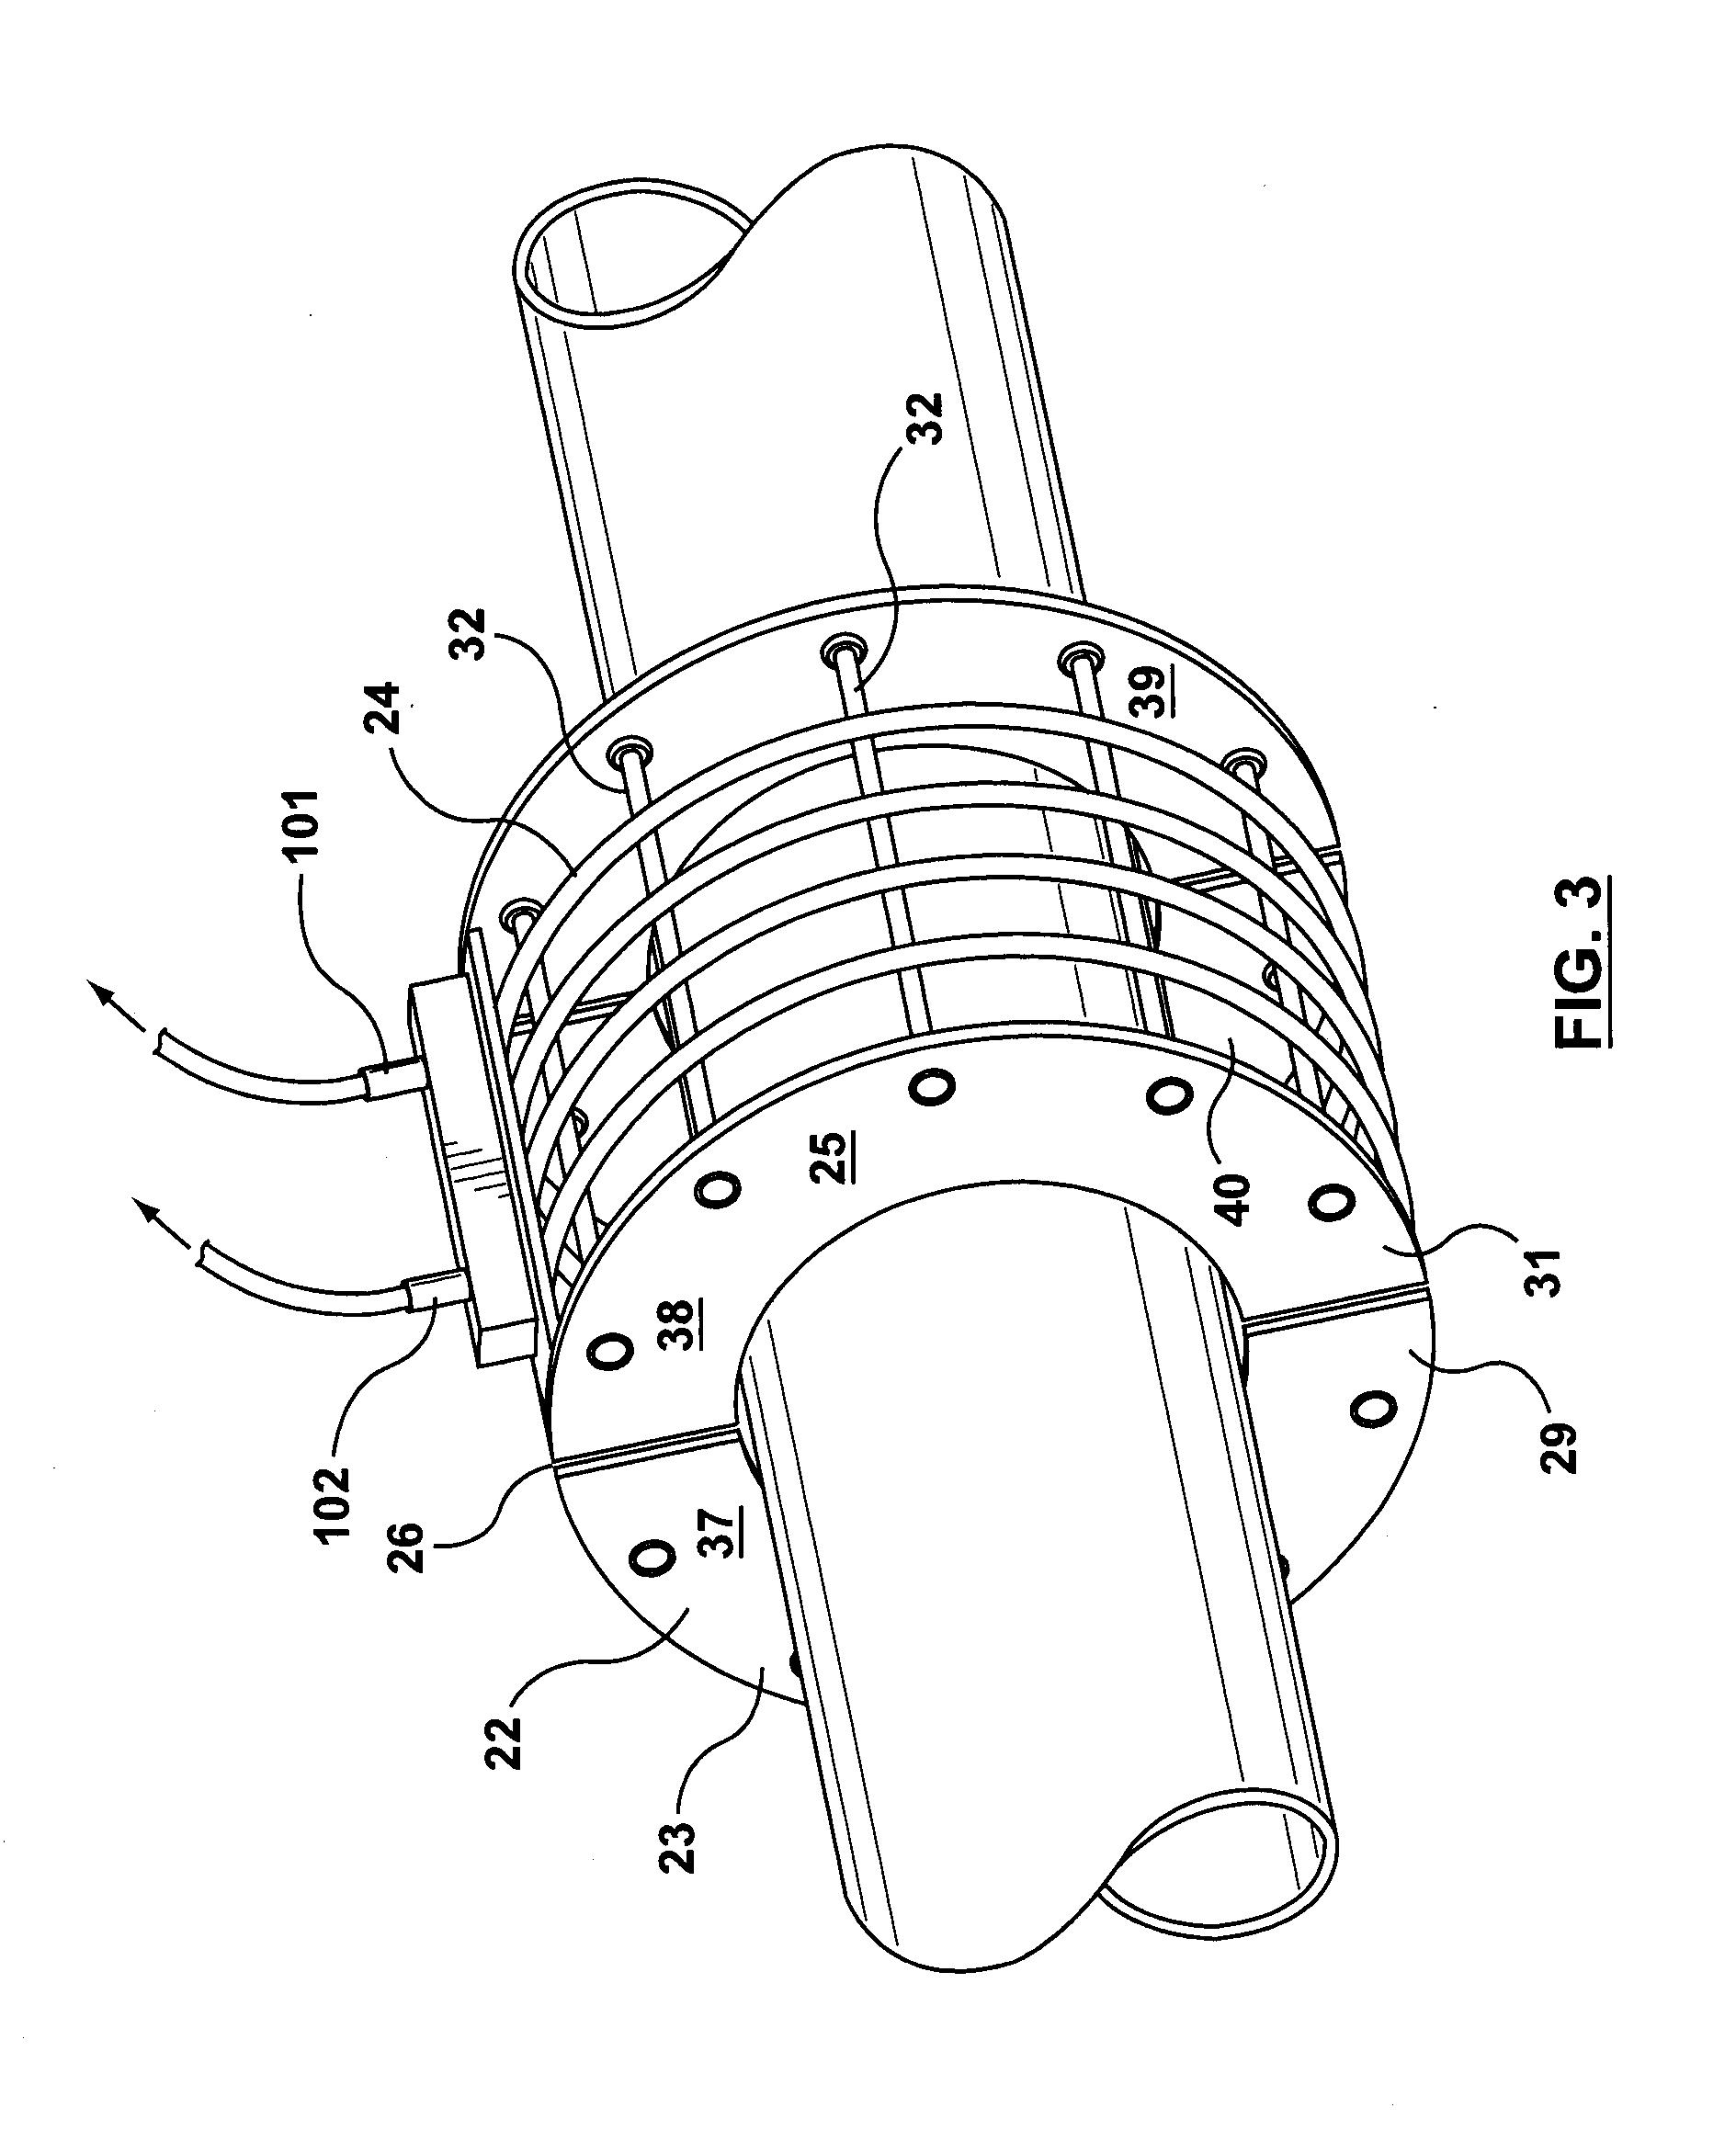 diagrams circuit of encoder and decoder  diagrams  free